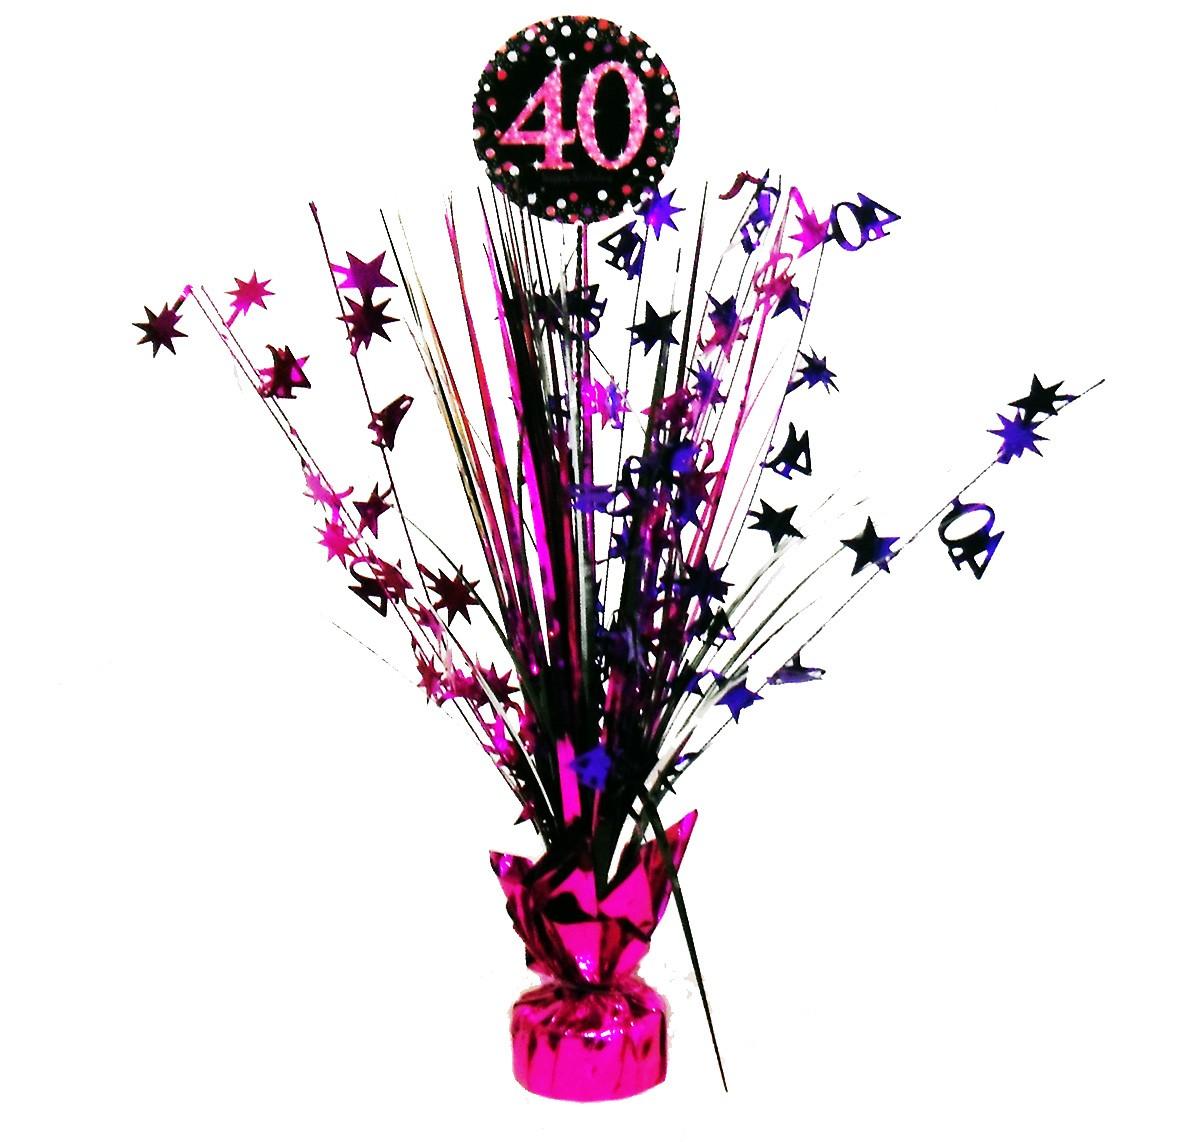 40 Geburtstag Pink Sparkling Tischfontane 46cm Party De